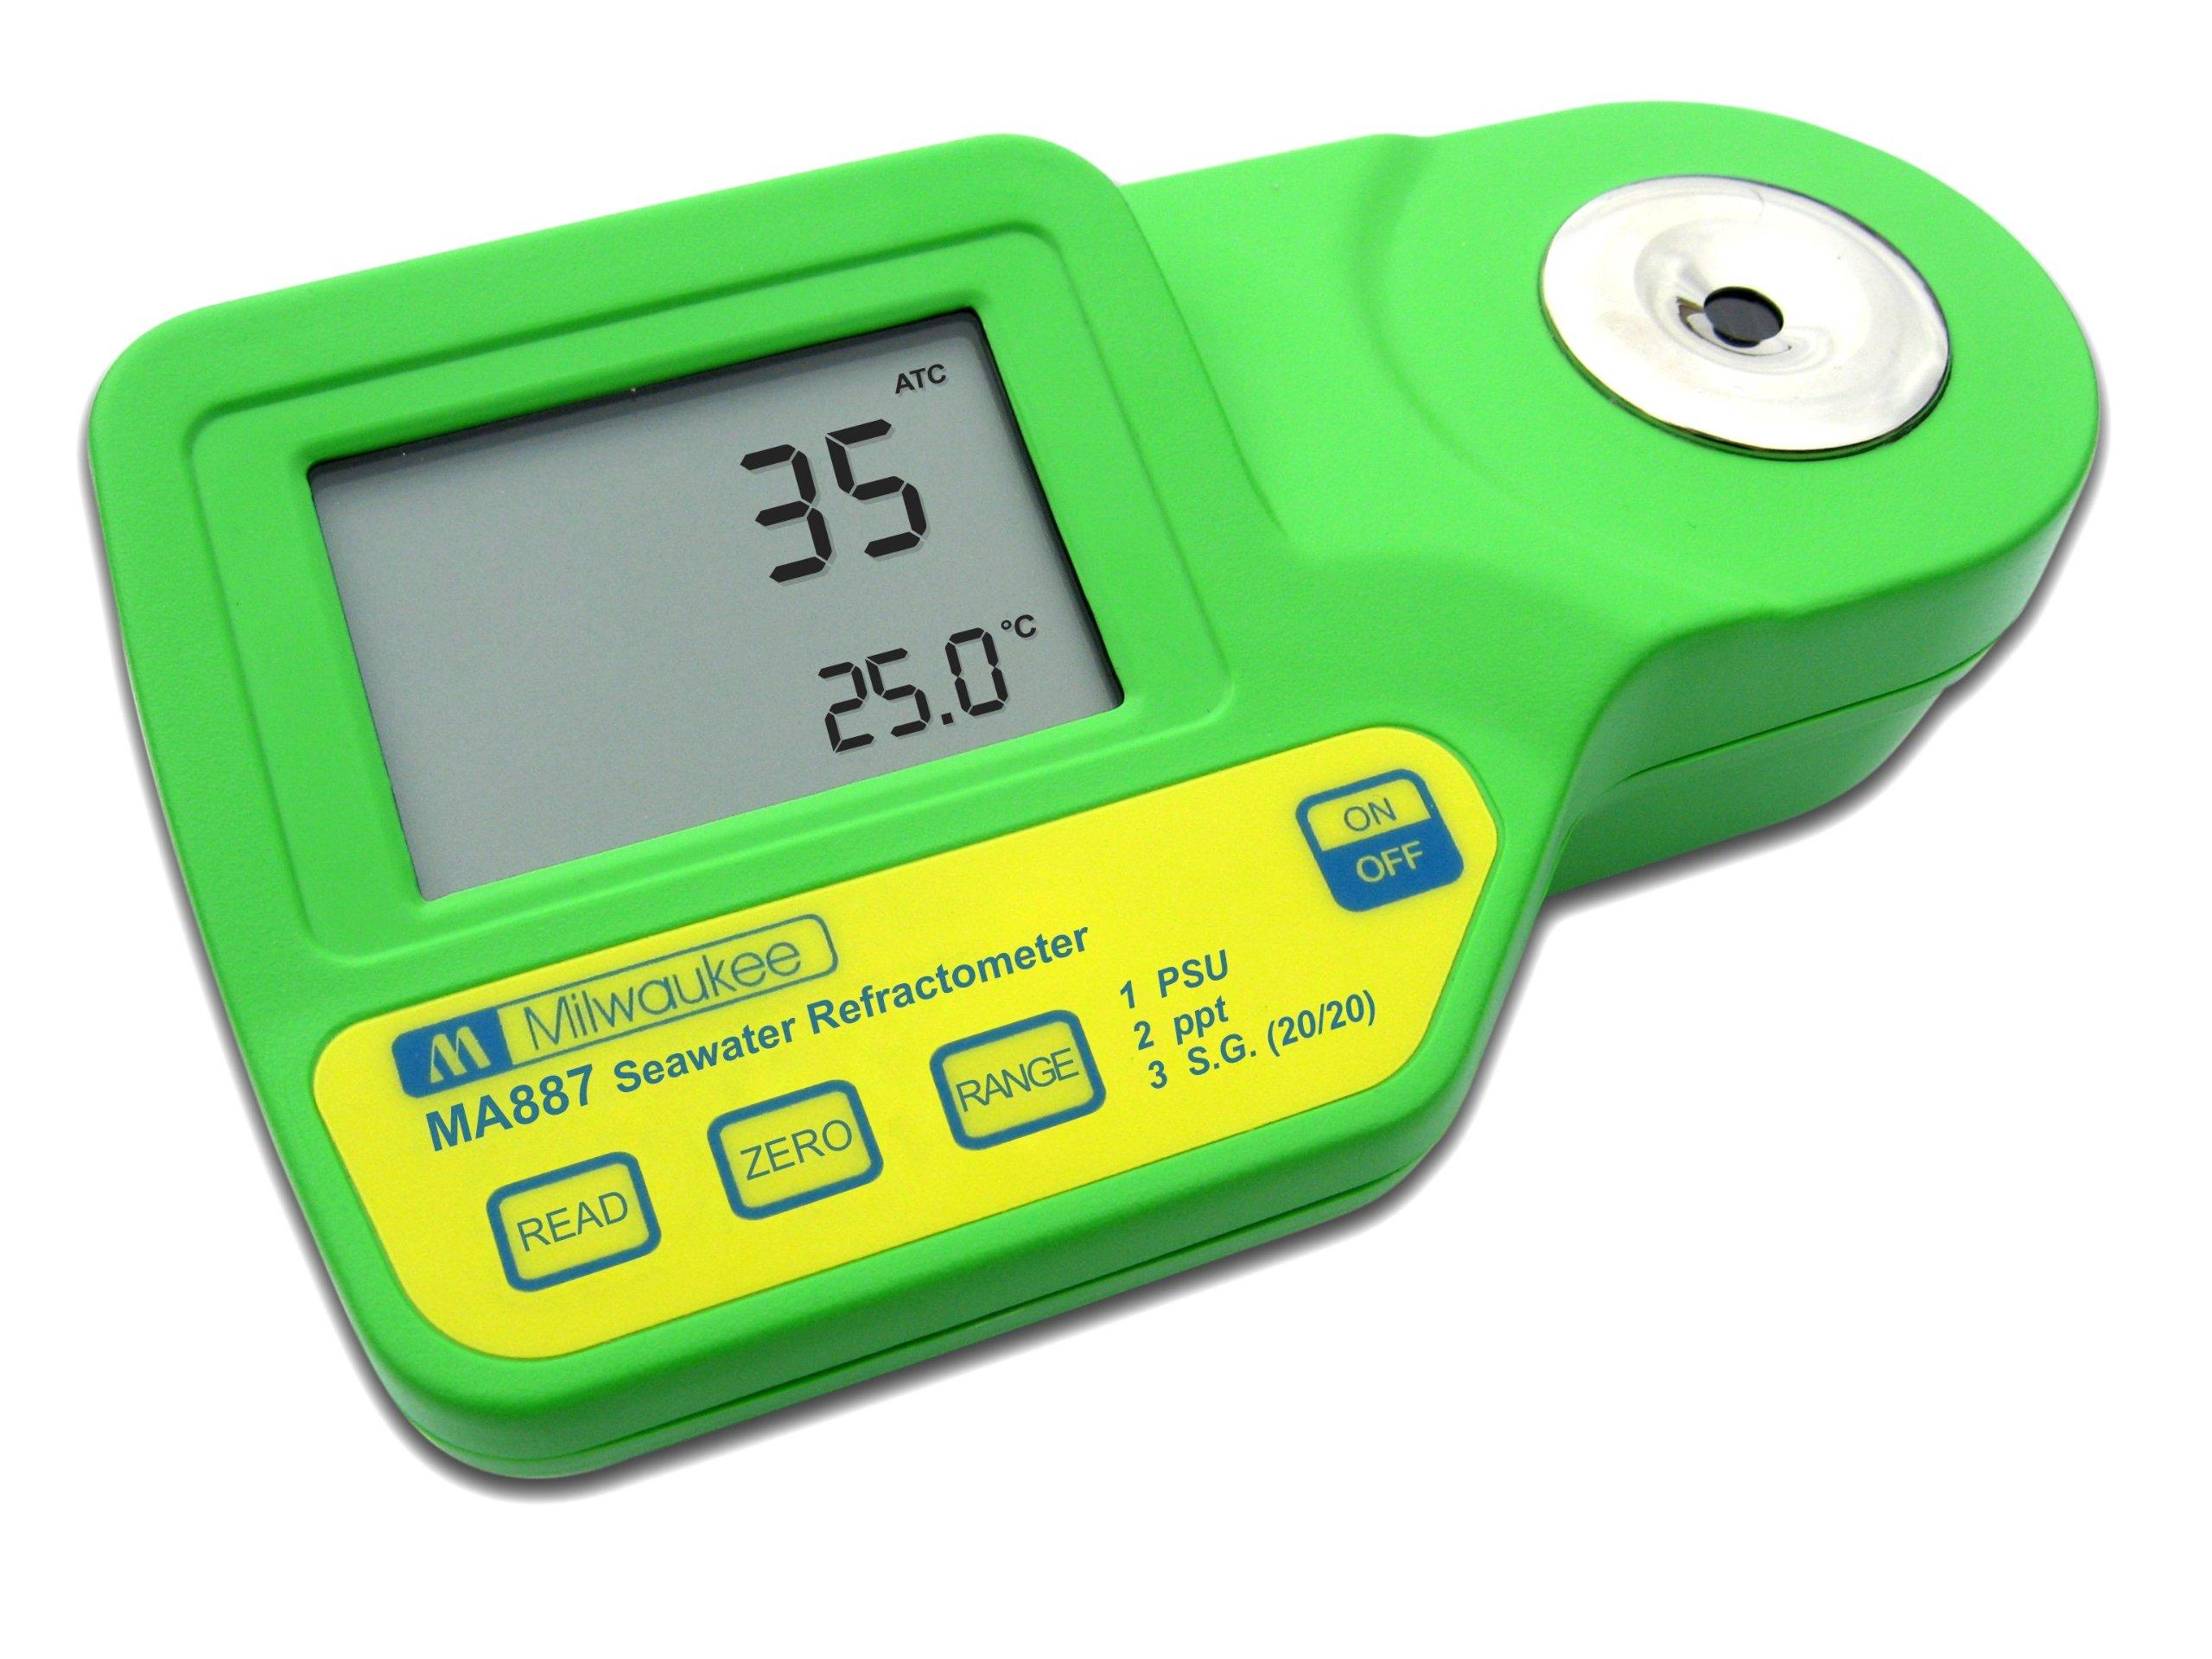 Milwaukee MA887 Digital Salinity Refractometer with Automatic Temperature Compensation, Yellow LED, 0 to 50 PSU, +/-2 PSU Accuracy, 1 PSU Resolution by Milwaukee